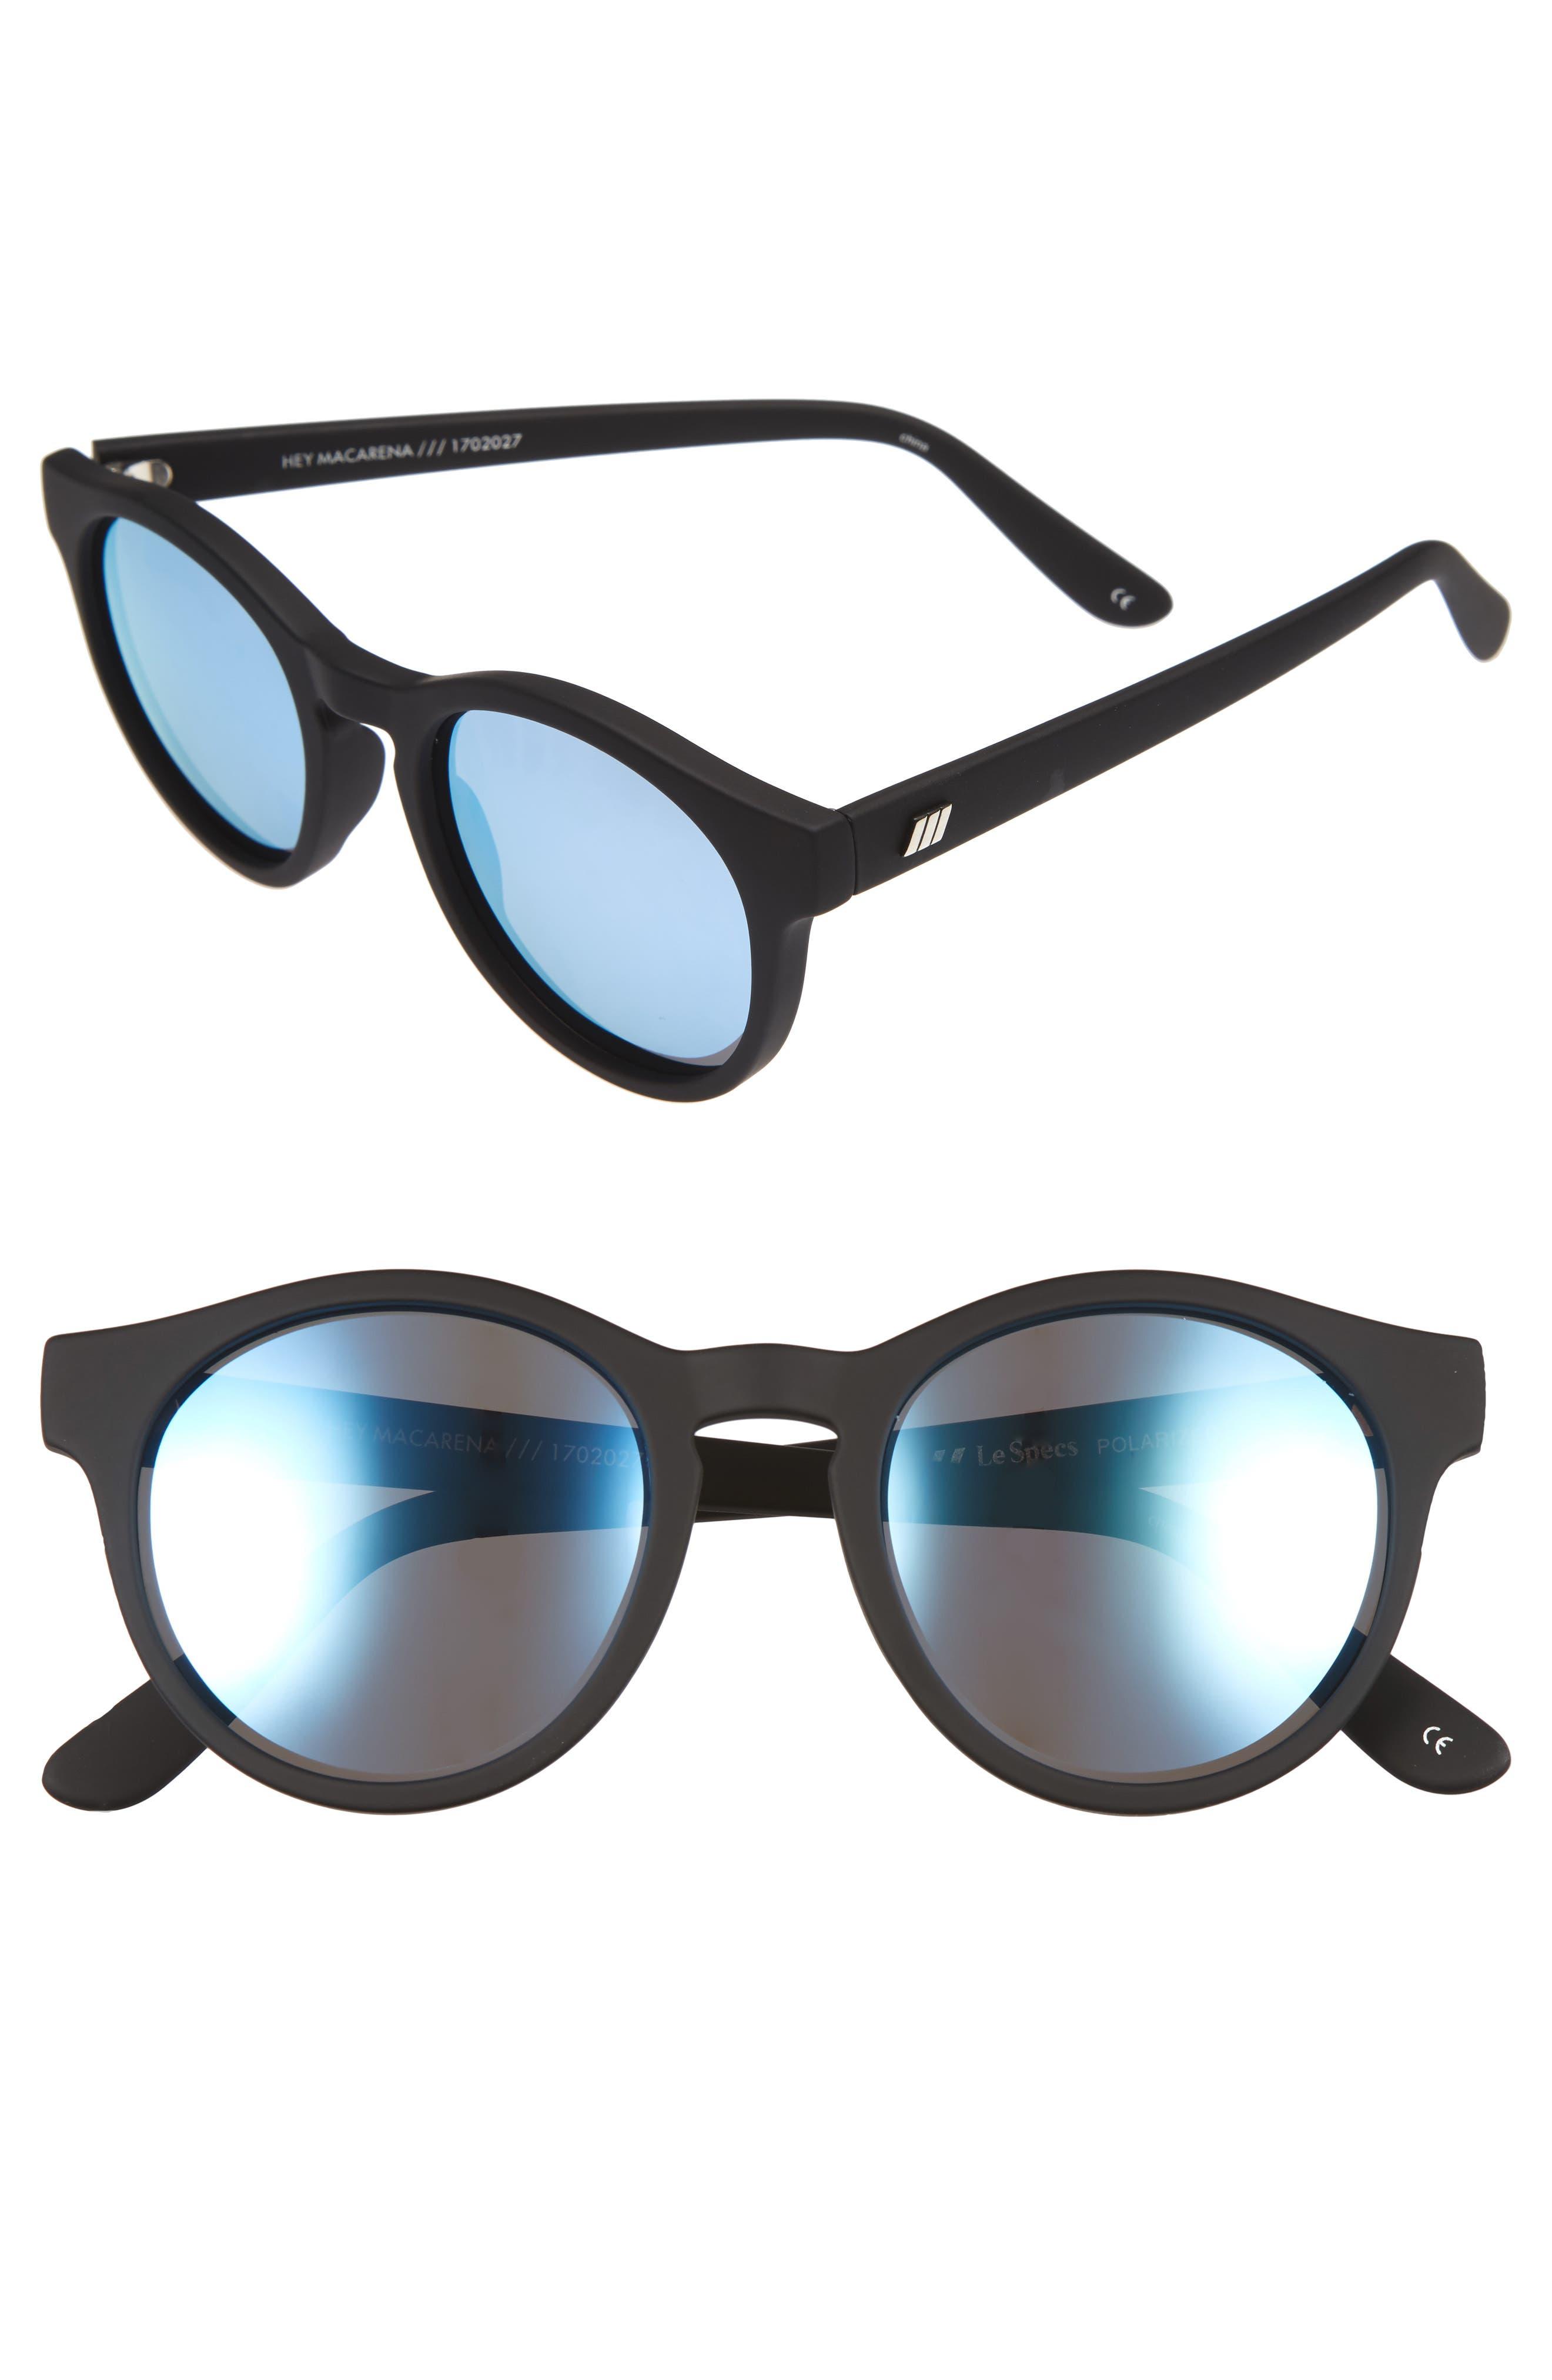 Main Image - Le Specs Hey Macarena 51mm Polarized Retro Sunglasses